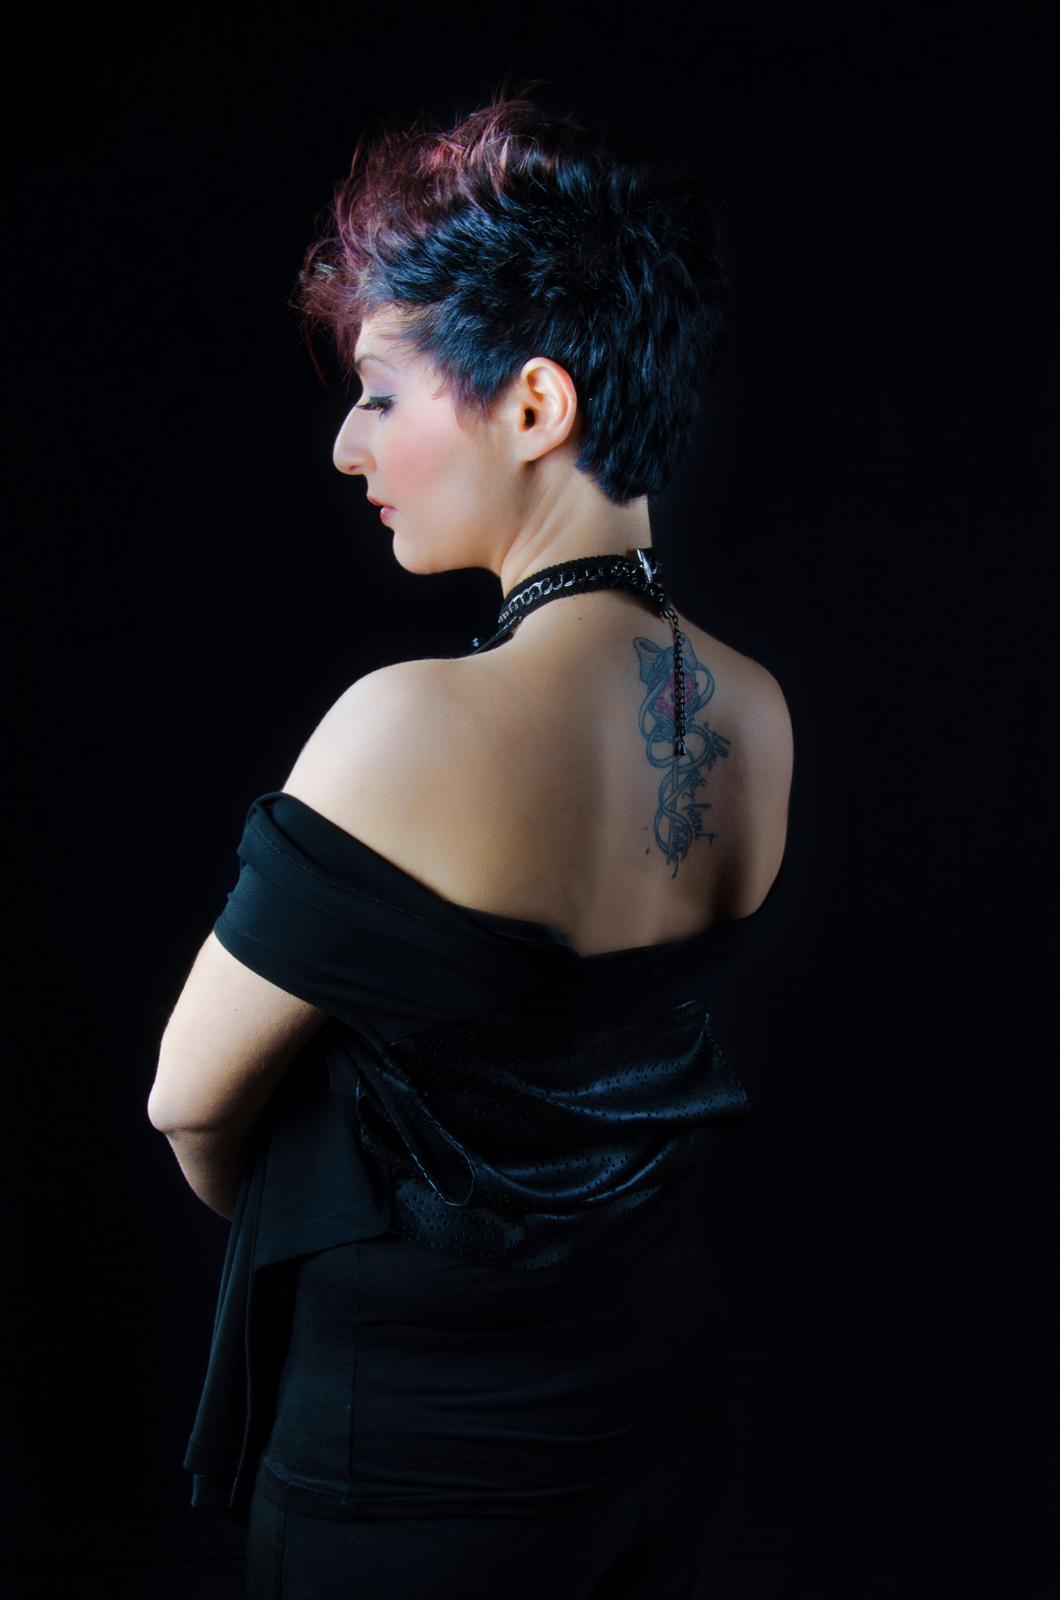 immagine_donna_parrucchieri_torregrotta_messina_estetista_parrucchiere_uomo-donna_cosmetici_salone_Jessica8